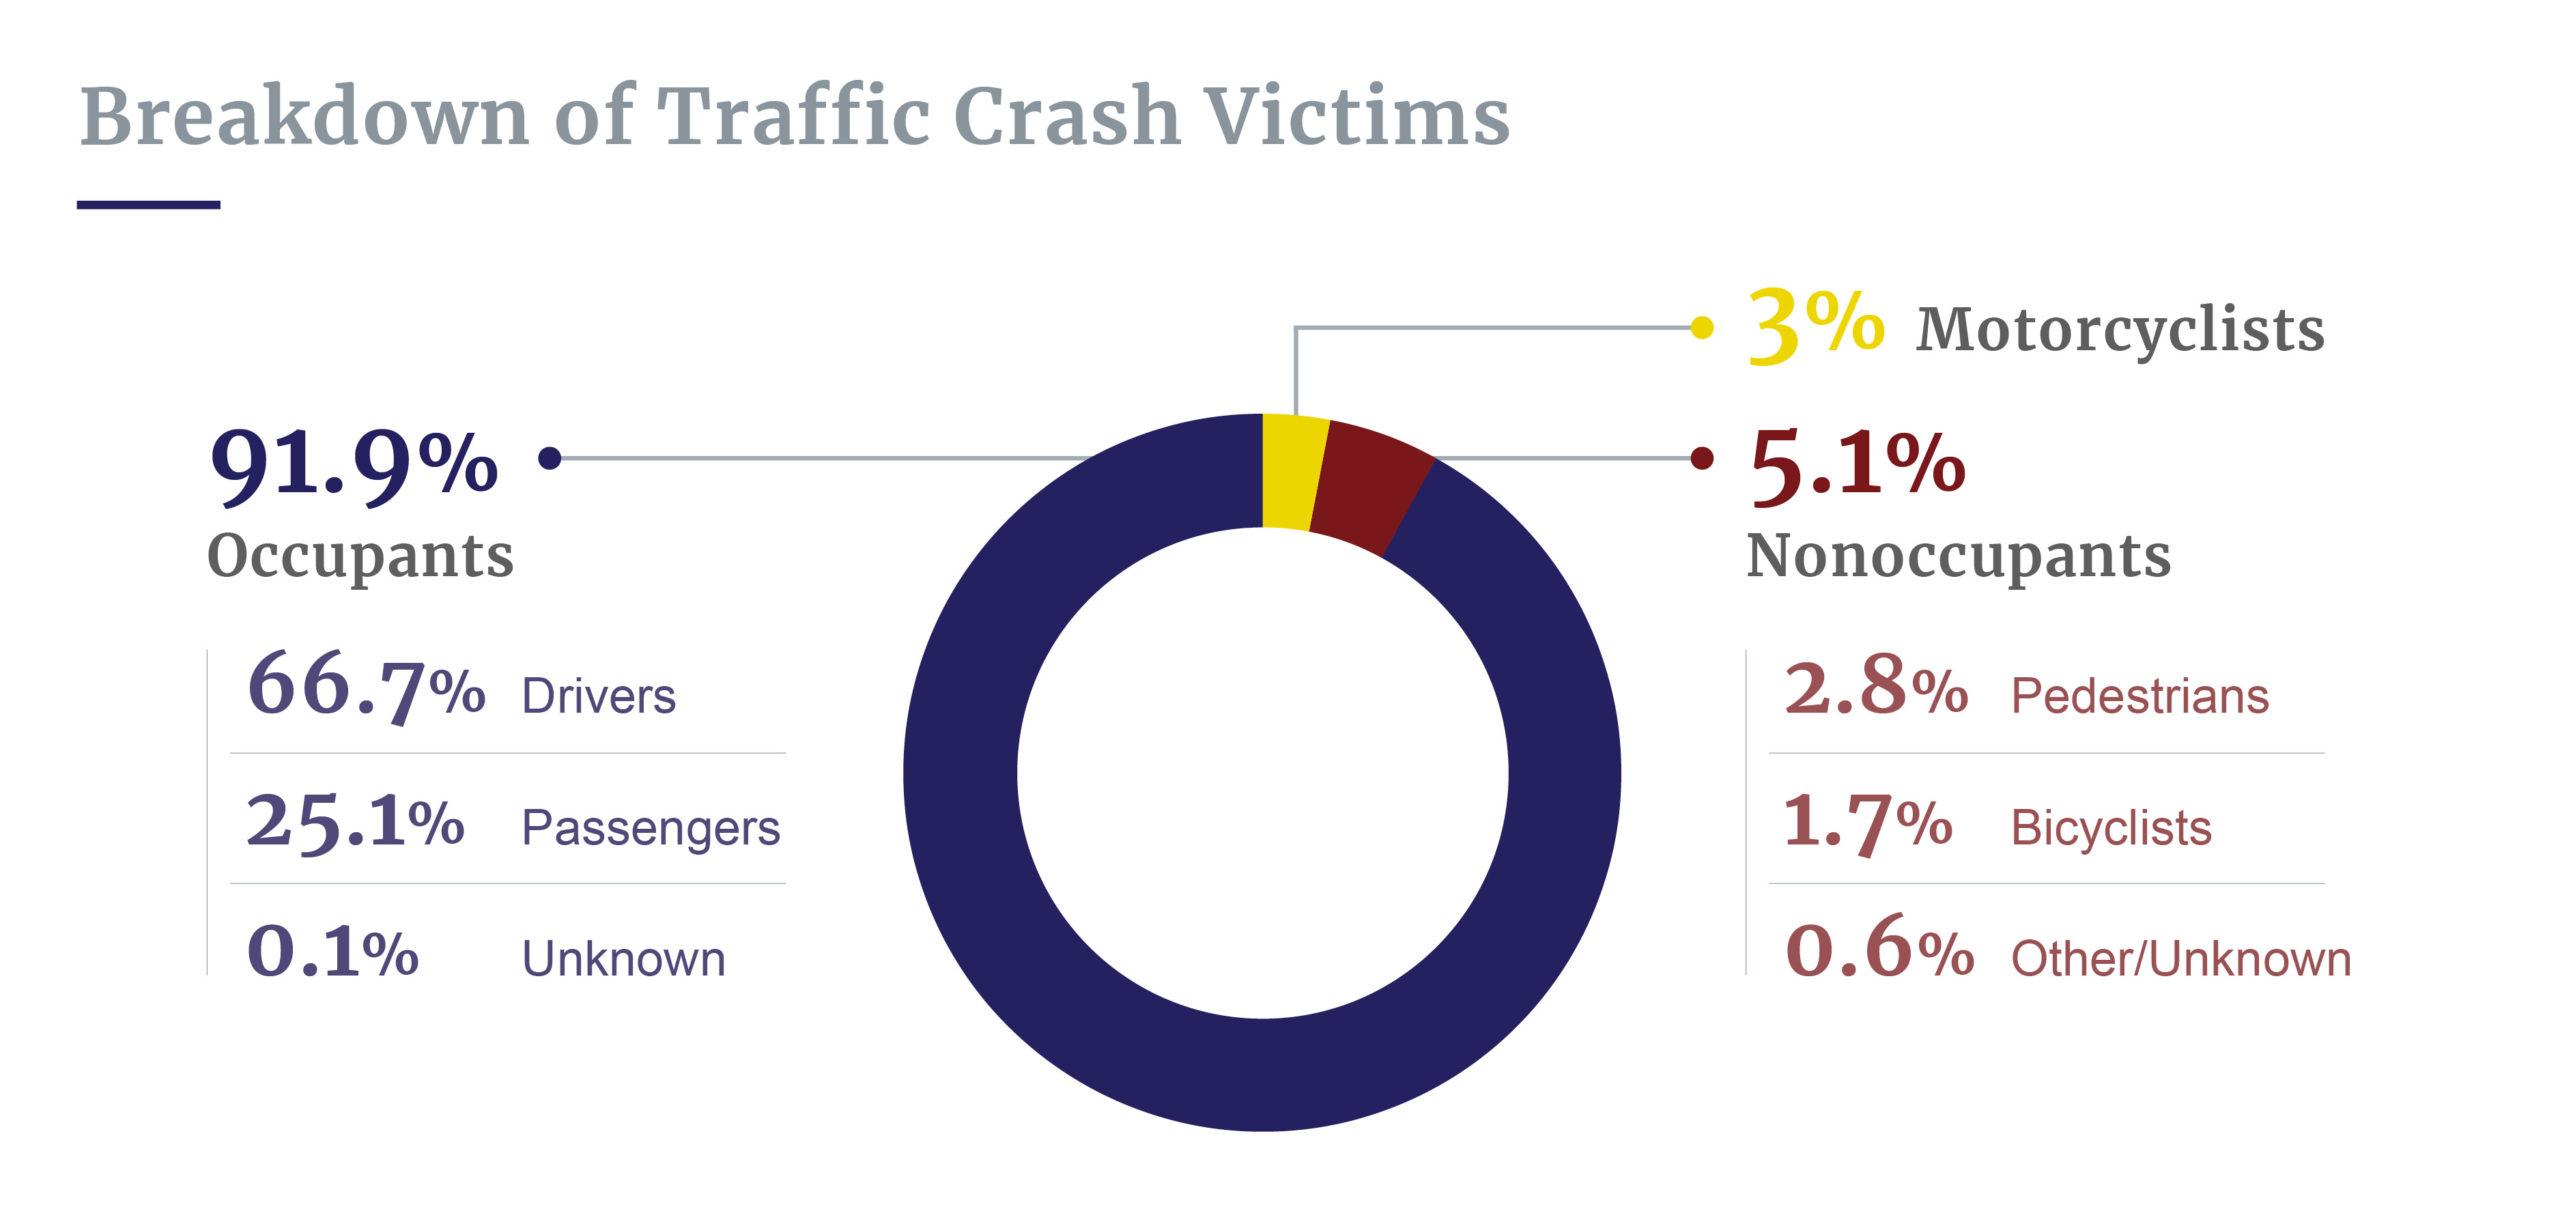 Breakdown of traffic crash victims